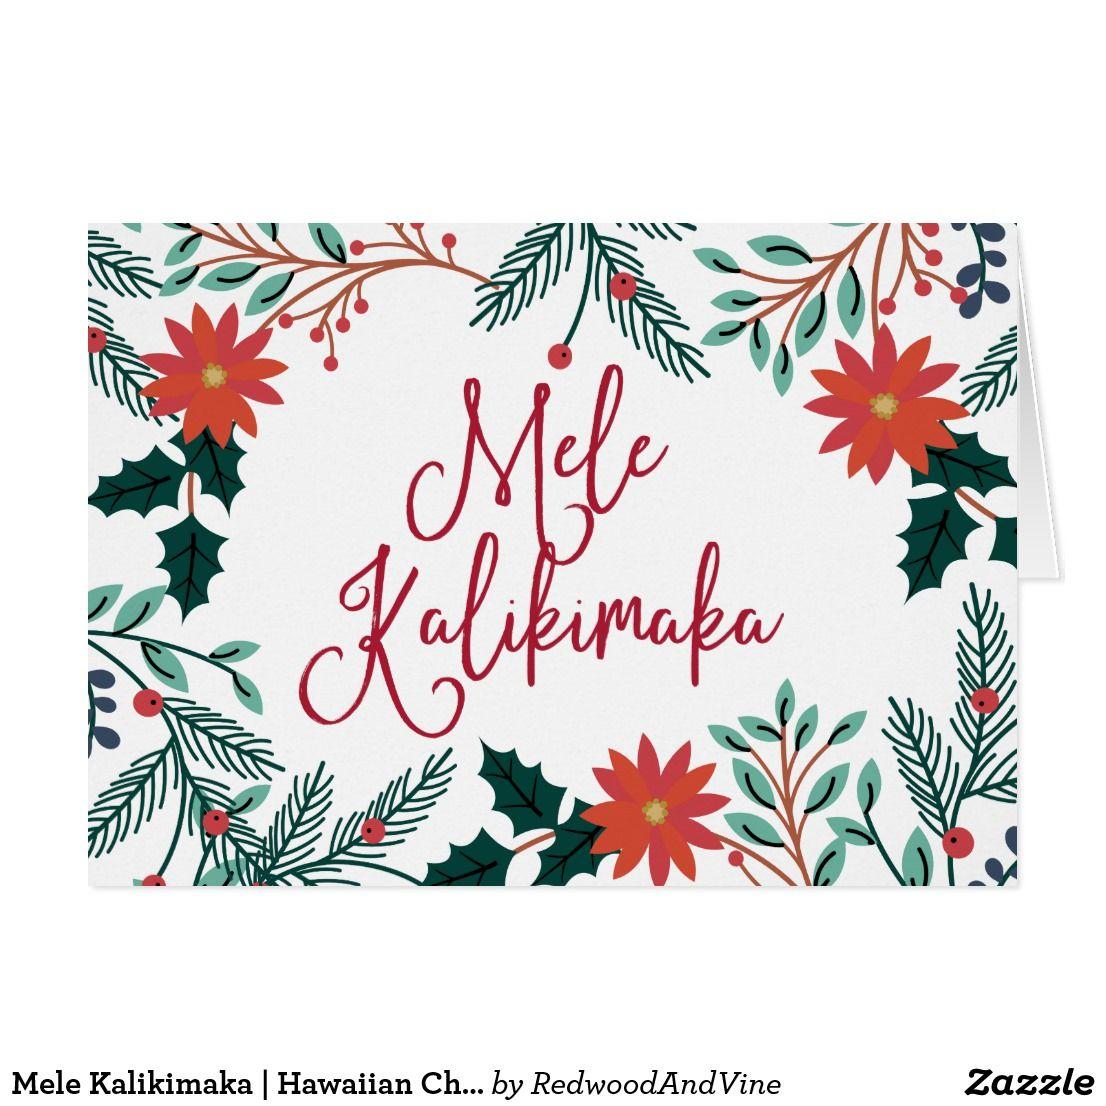 Mele Kalikimaka Hawaiian Christmas Card Poinsettia Flower